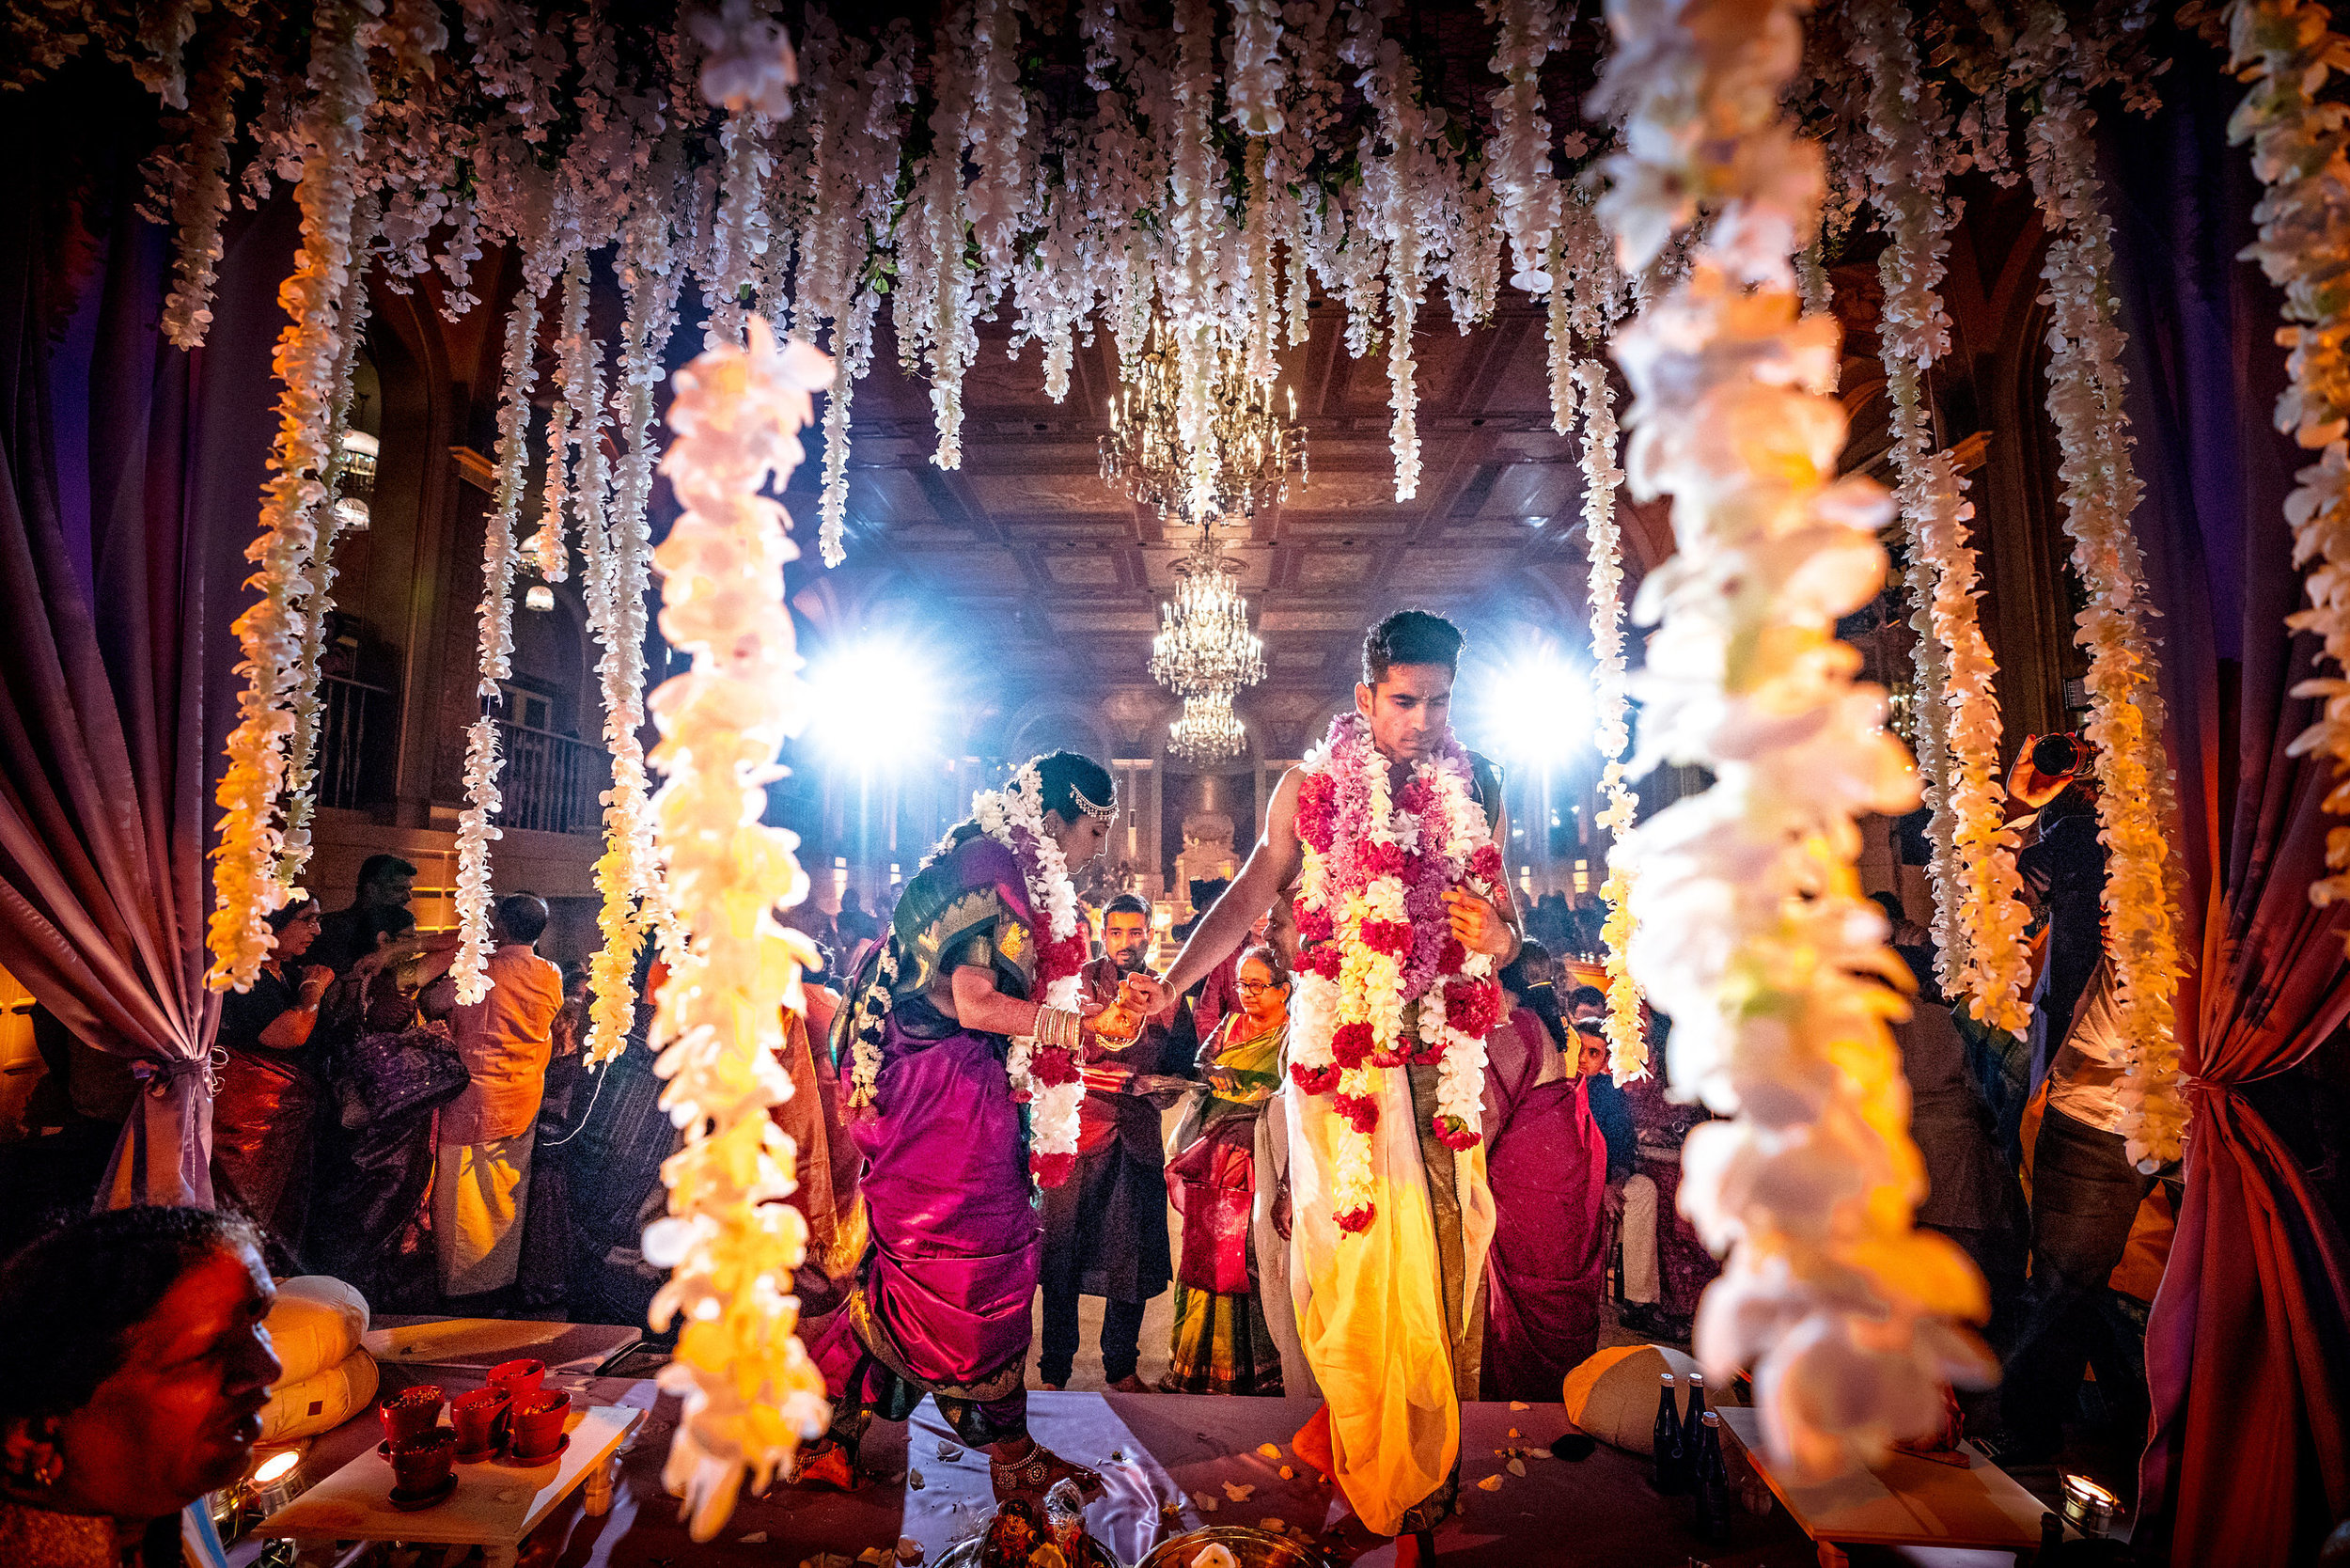 INDIAN WEDDING BRIDE AND GROOM ENTERING FLOWER ALTER.JPG